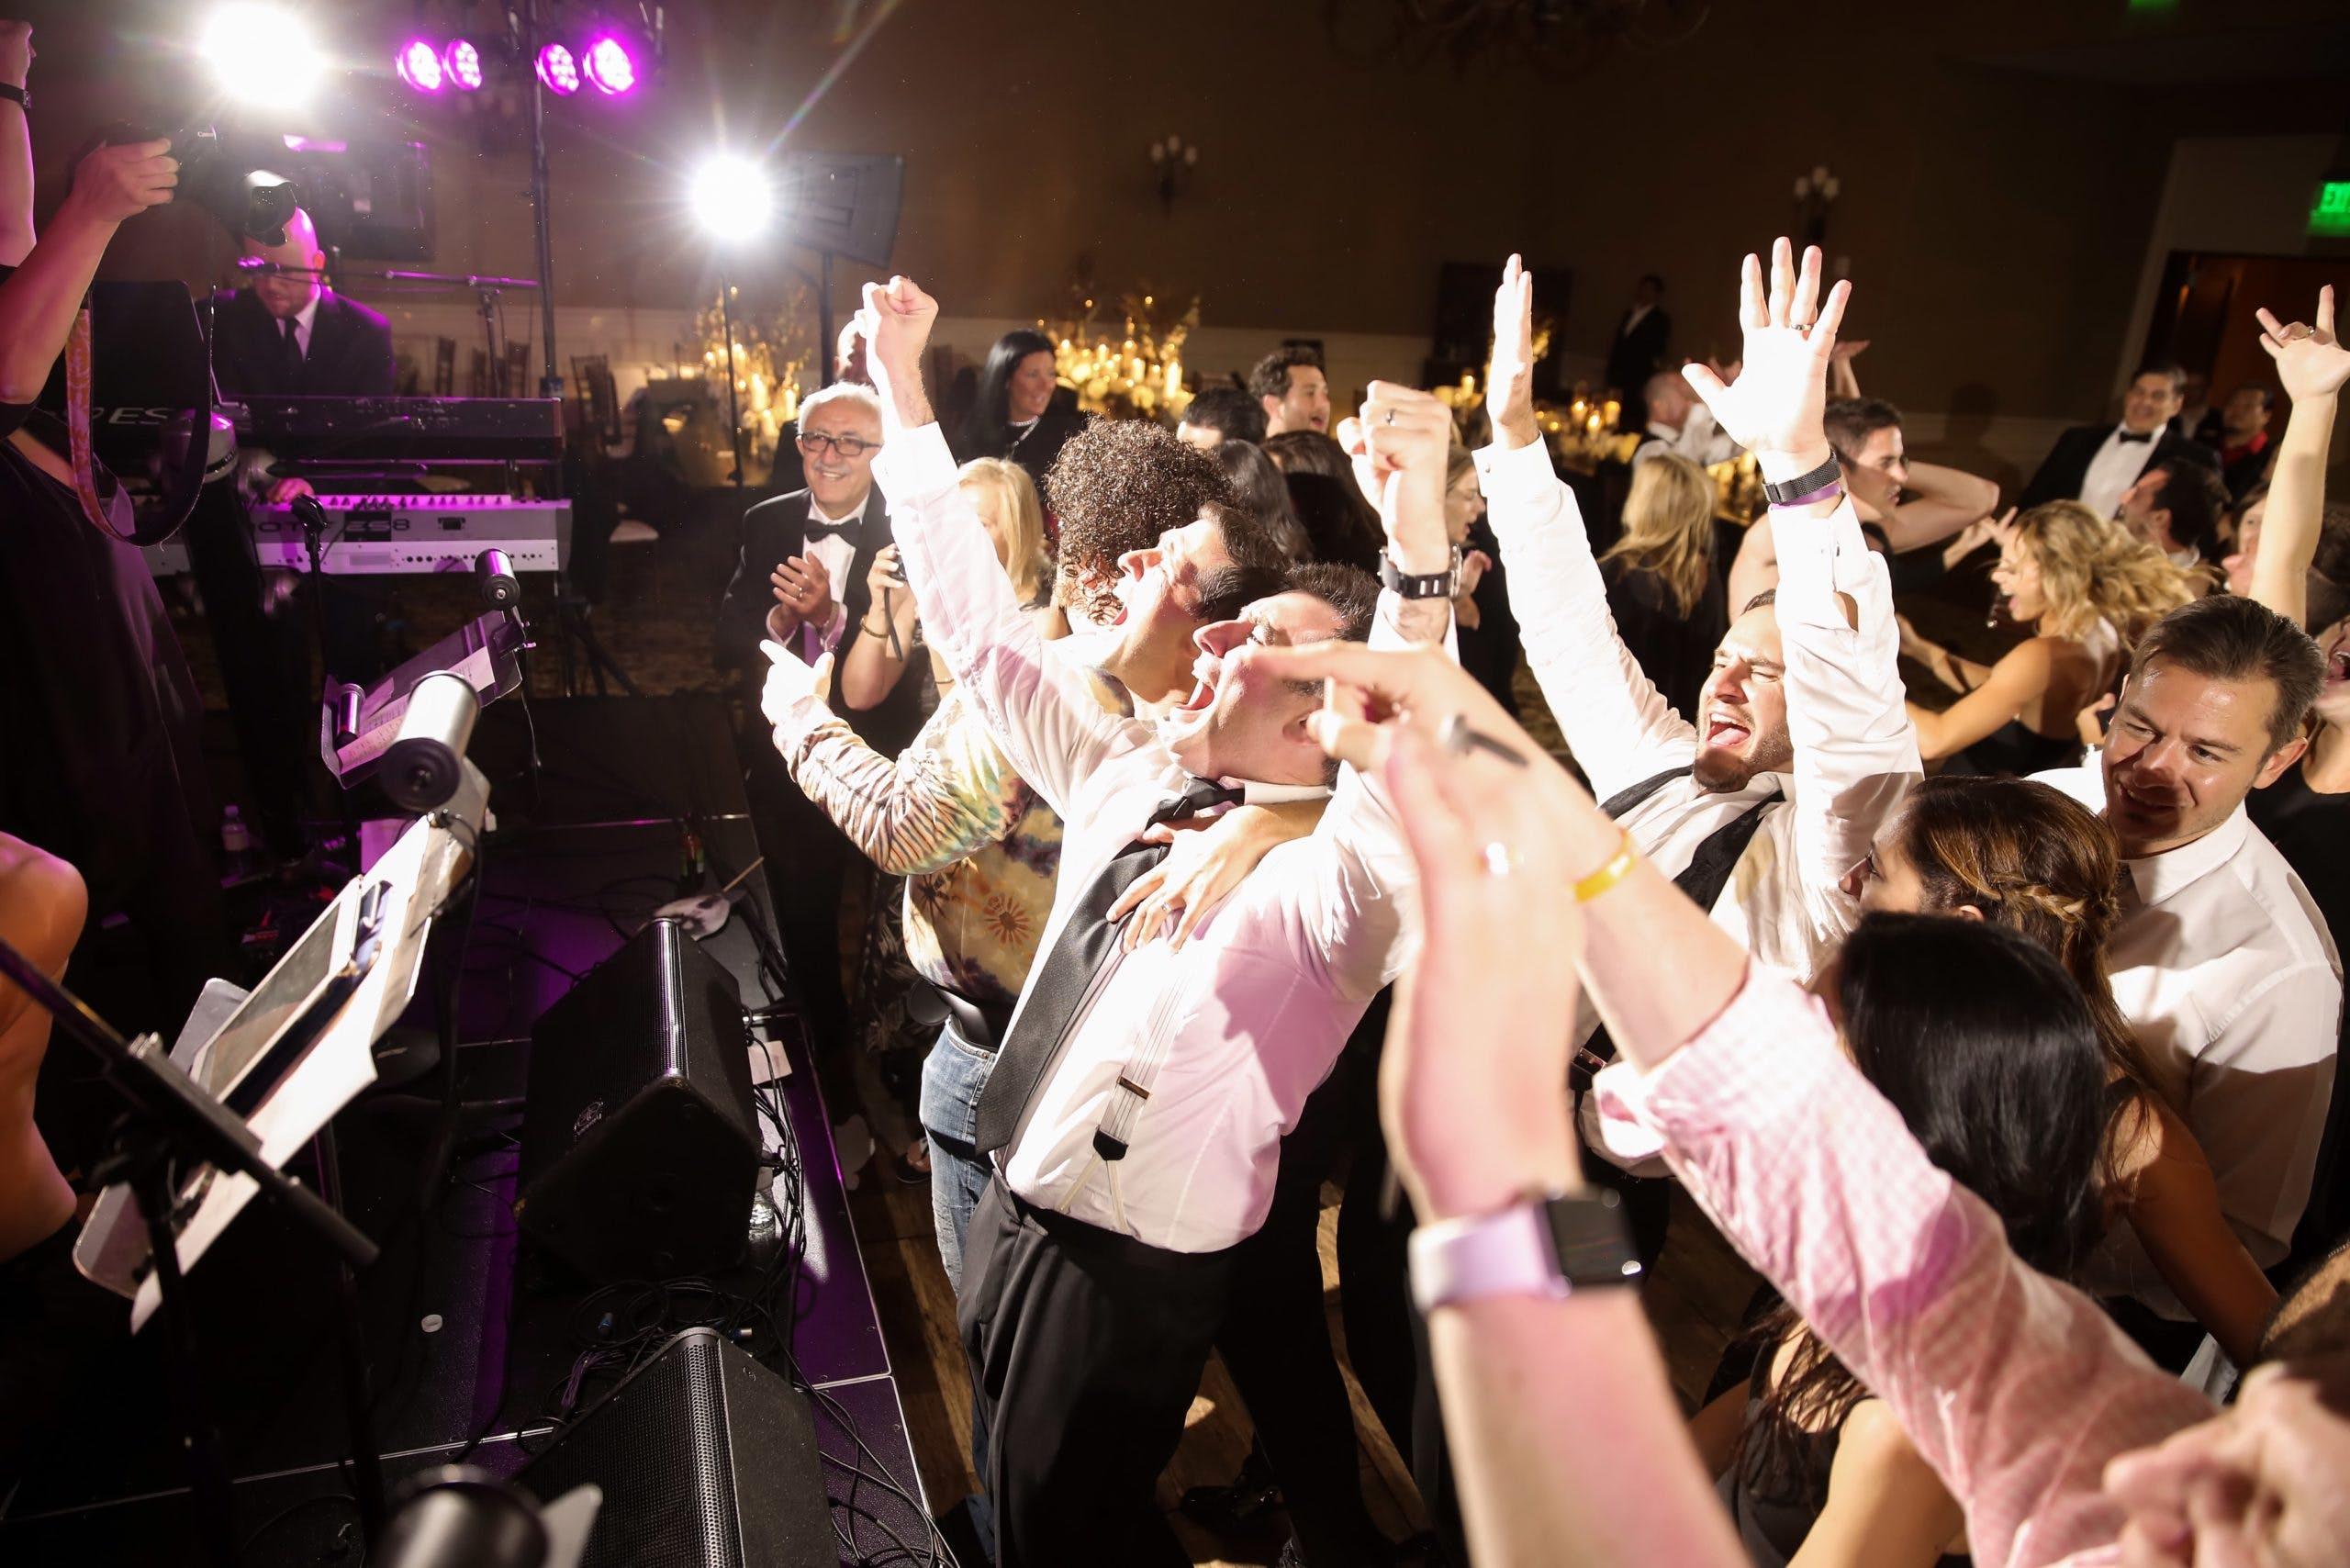 Wedding at Montage Deer Valley crowded dance floor   PartySlate